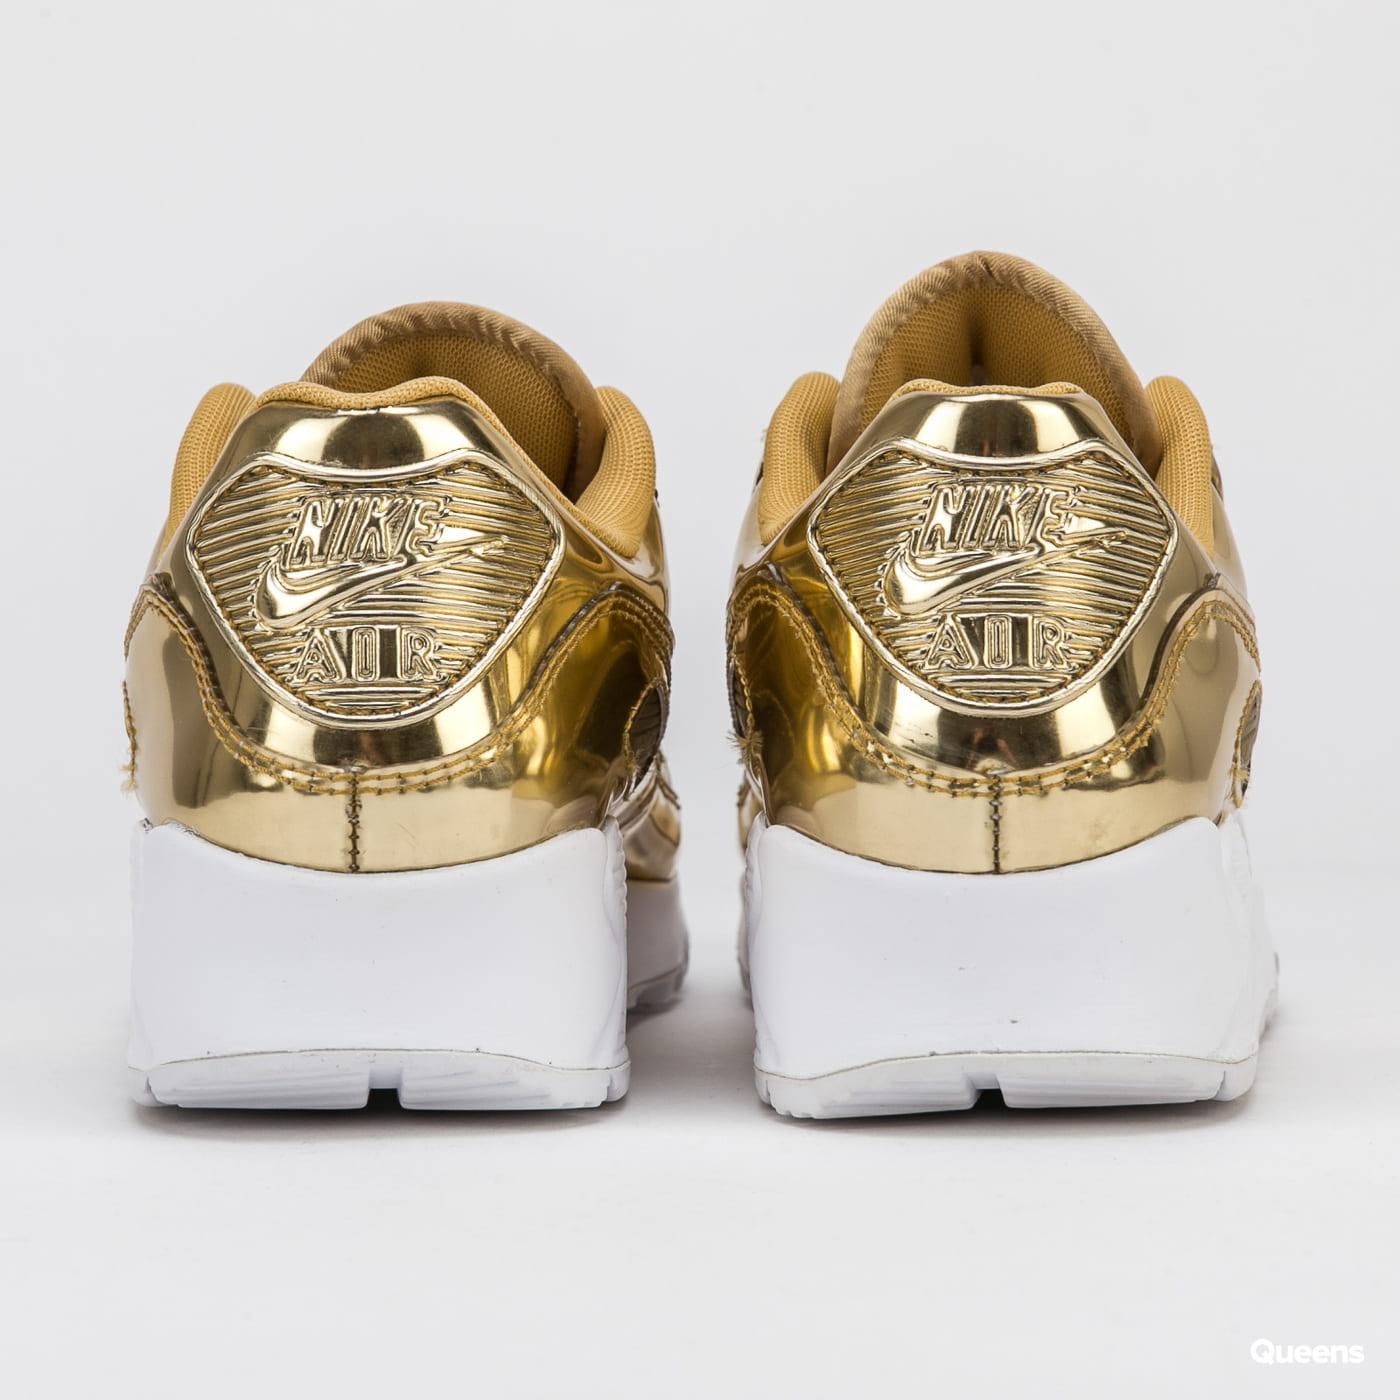 Nike W Air Max 90 SP metallic gold / metallic gold